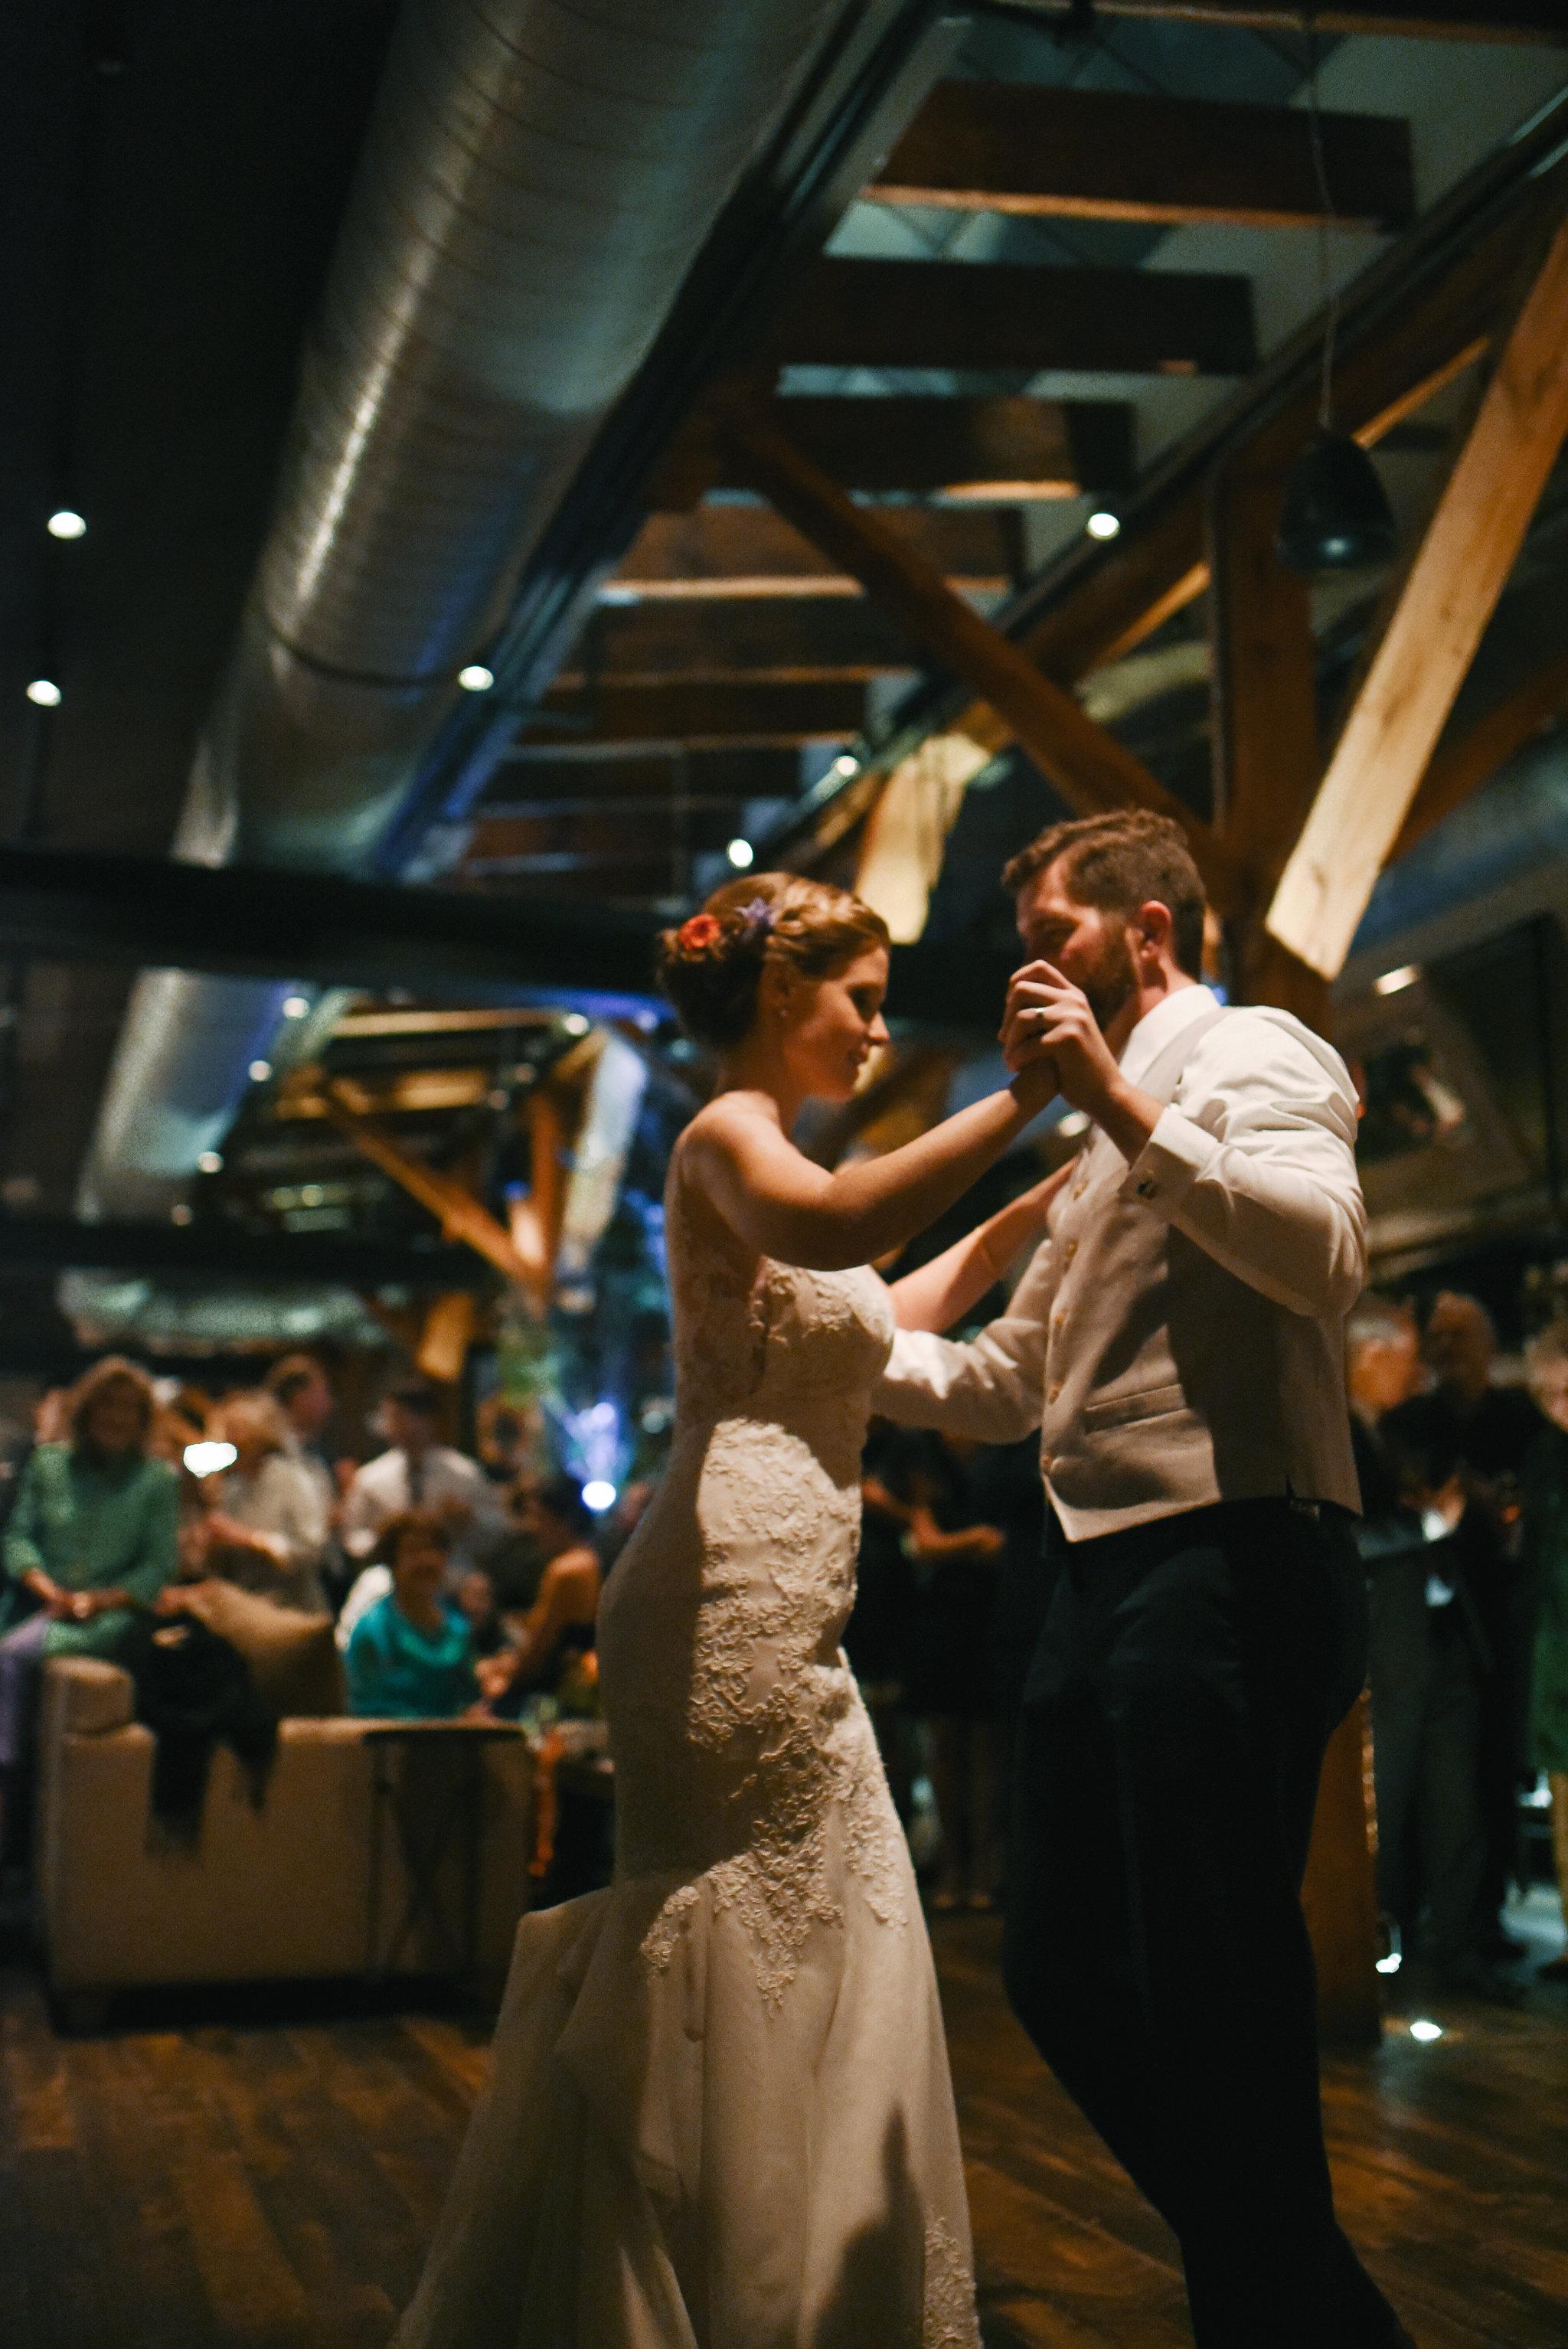 Alexandria, DC, Fall Wedding, Reception, Virtue Feed and Grain, First Dance, Rustic Wedding, Romantic, Lian Carlo Dress, Bride and Groom